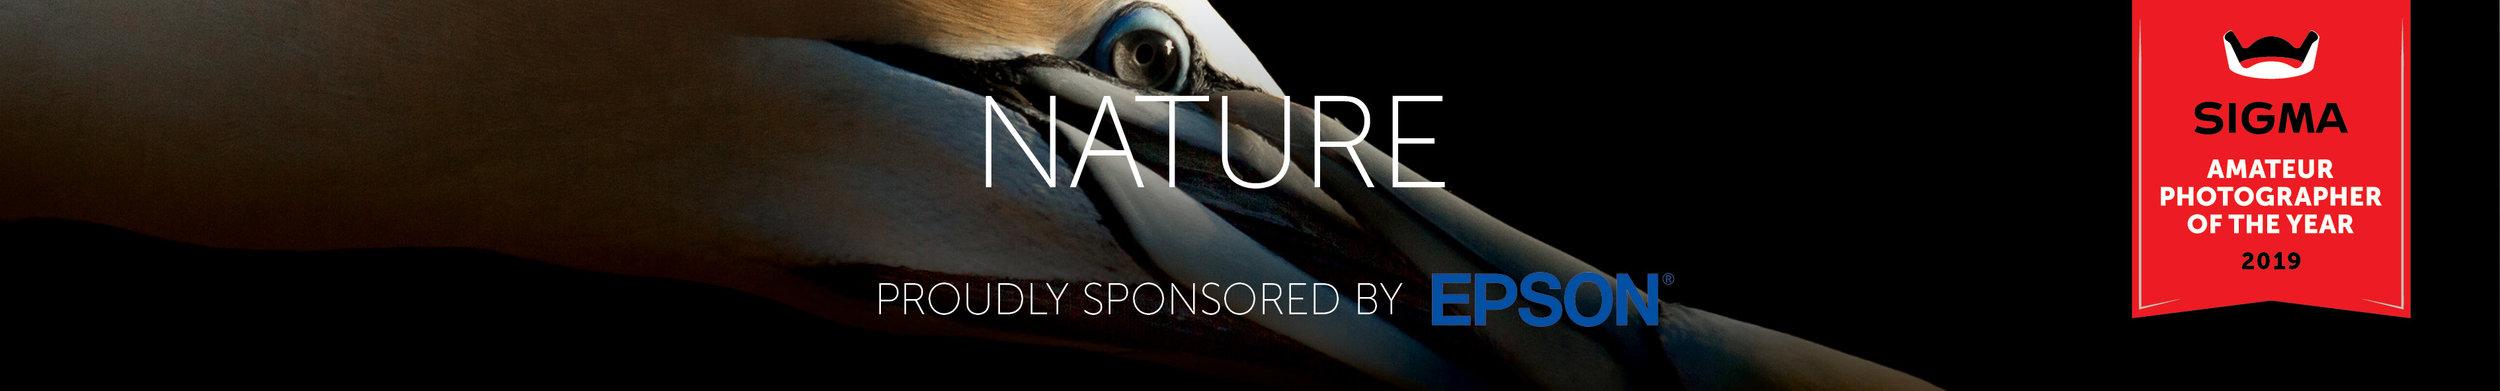 Nature 320x50px.jpg